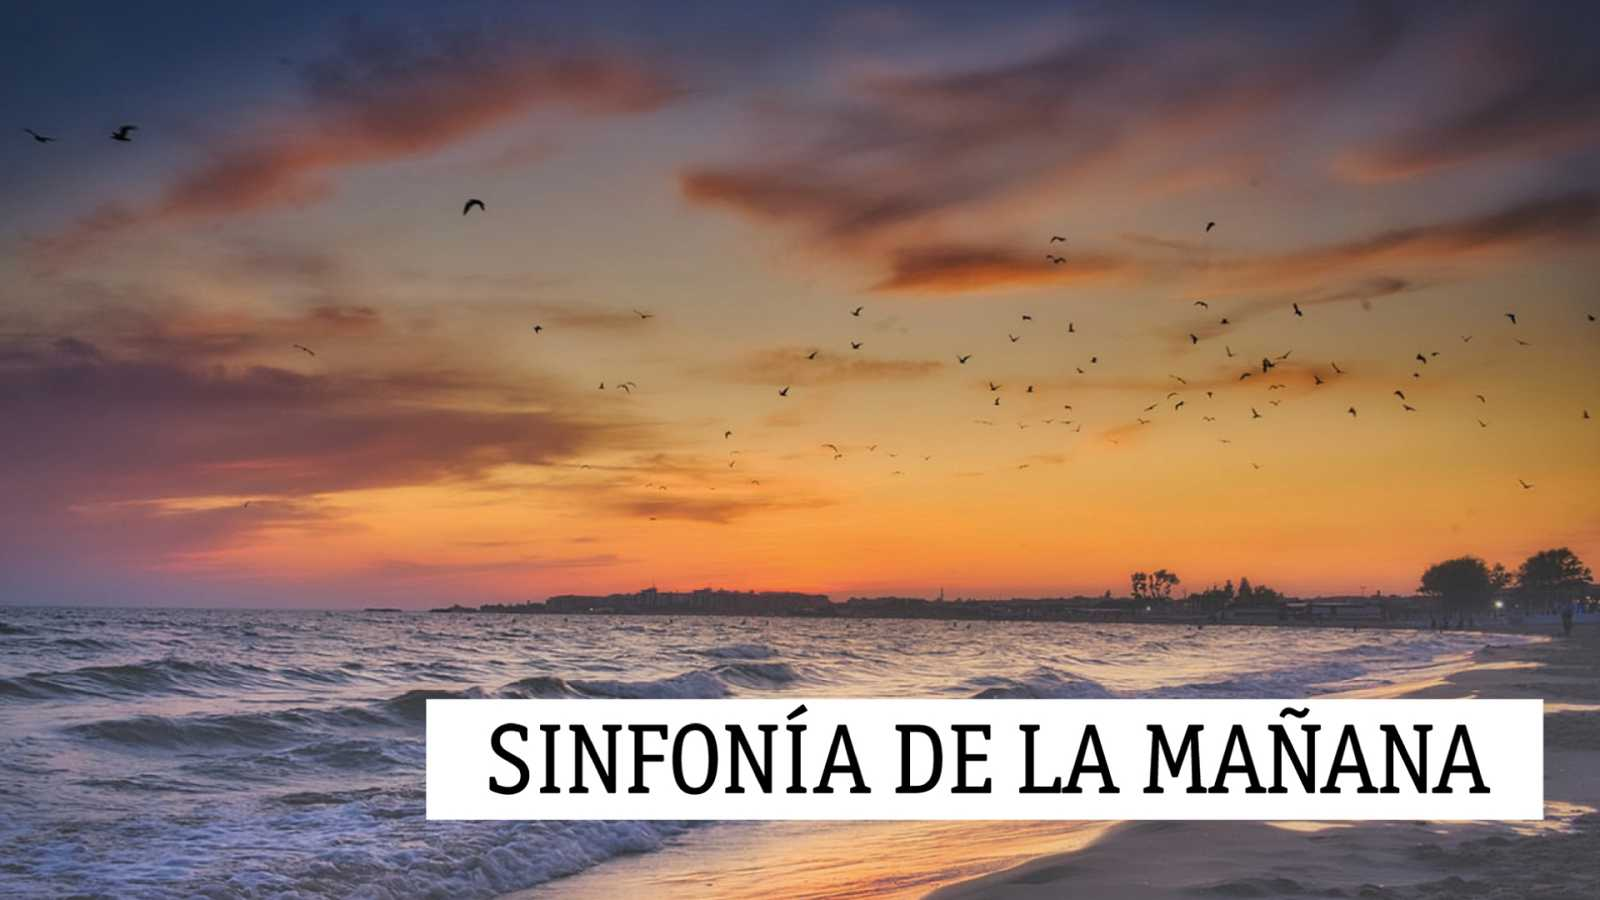 Sinfonía de la mañana - Sinfonía de campaña: Sergiu Celibidache - 22/05/20 - escuchar ahora